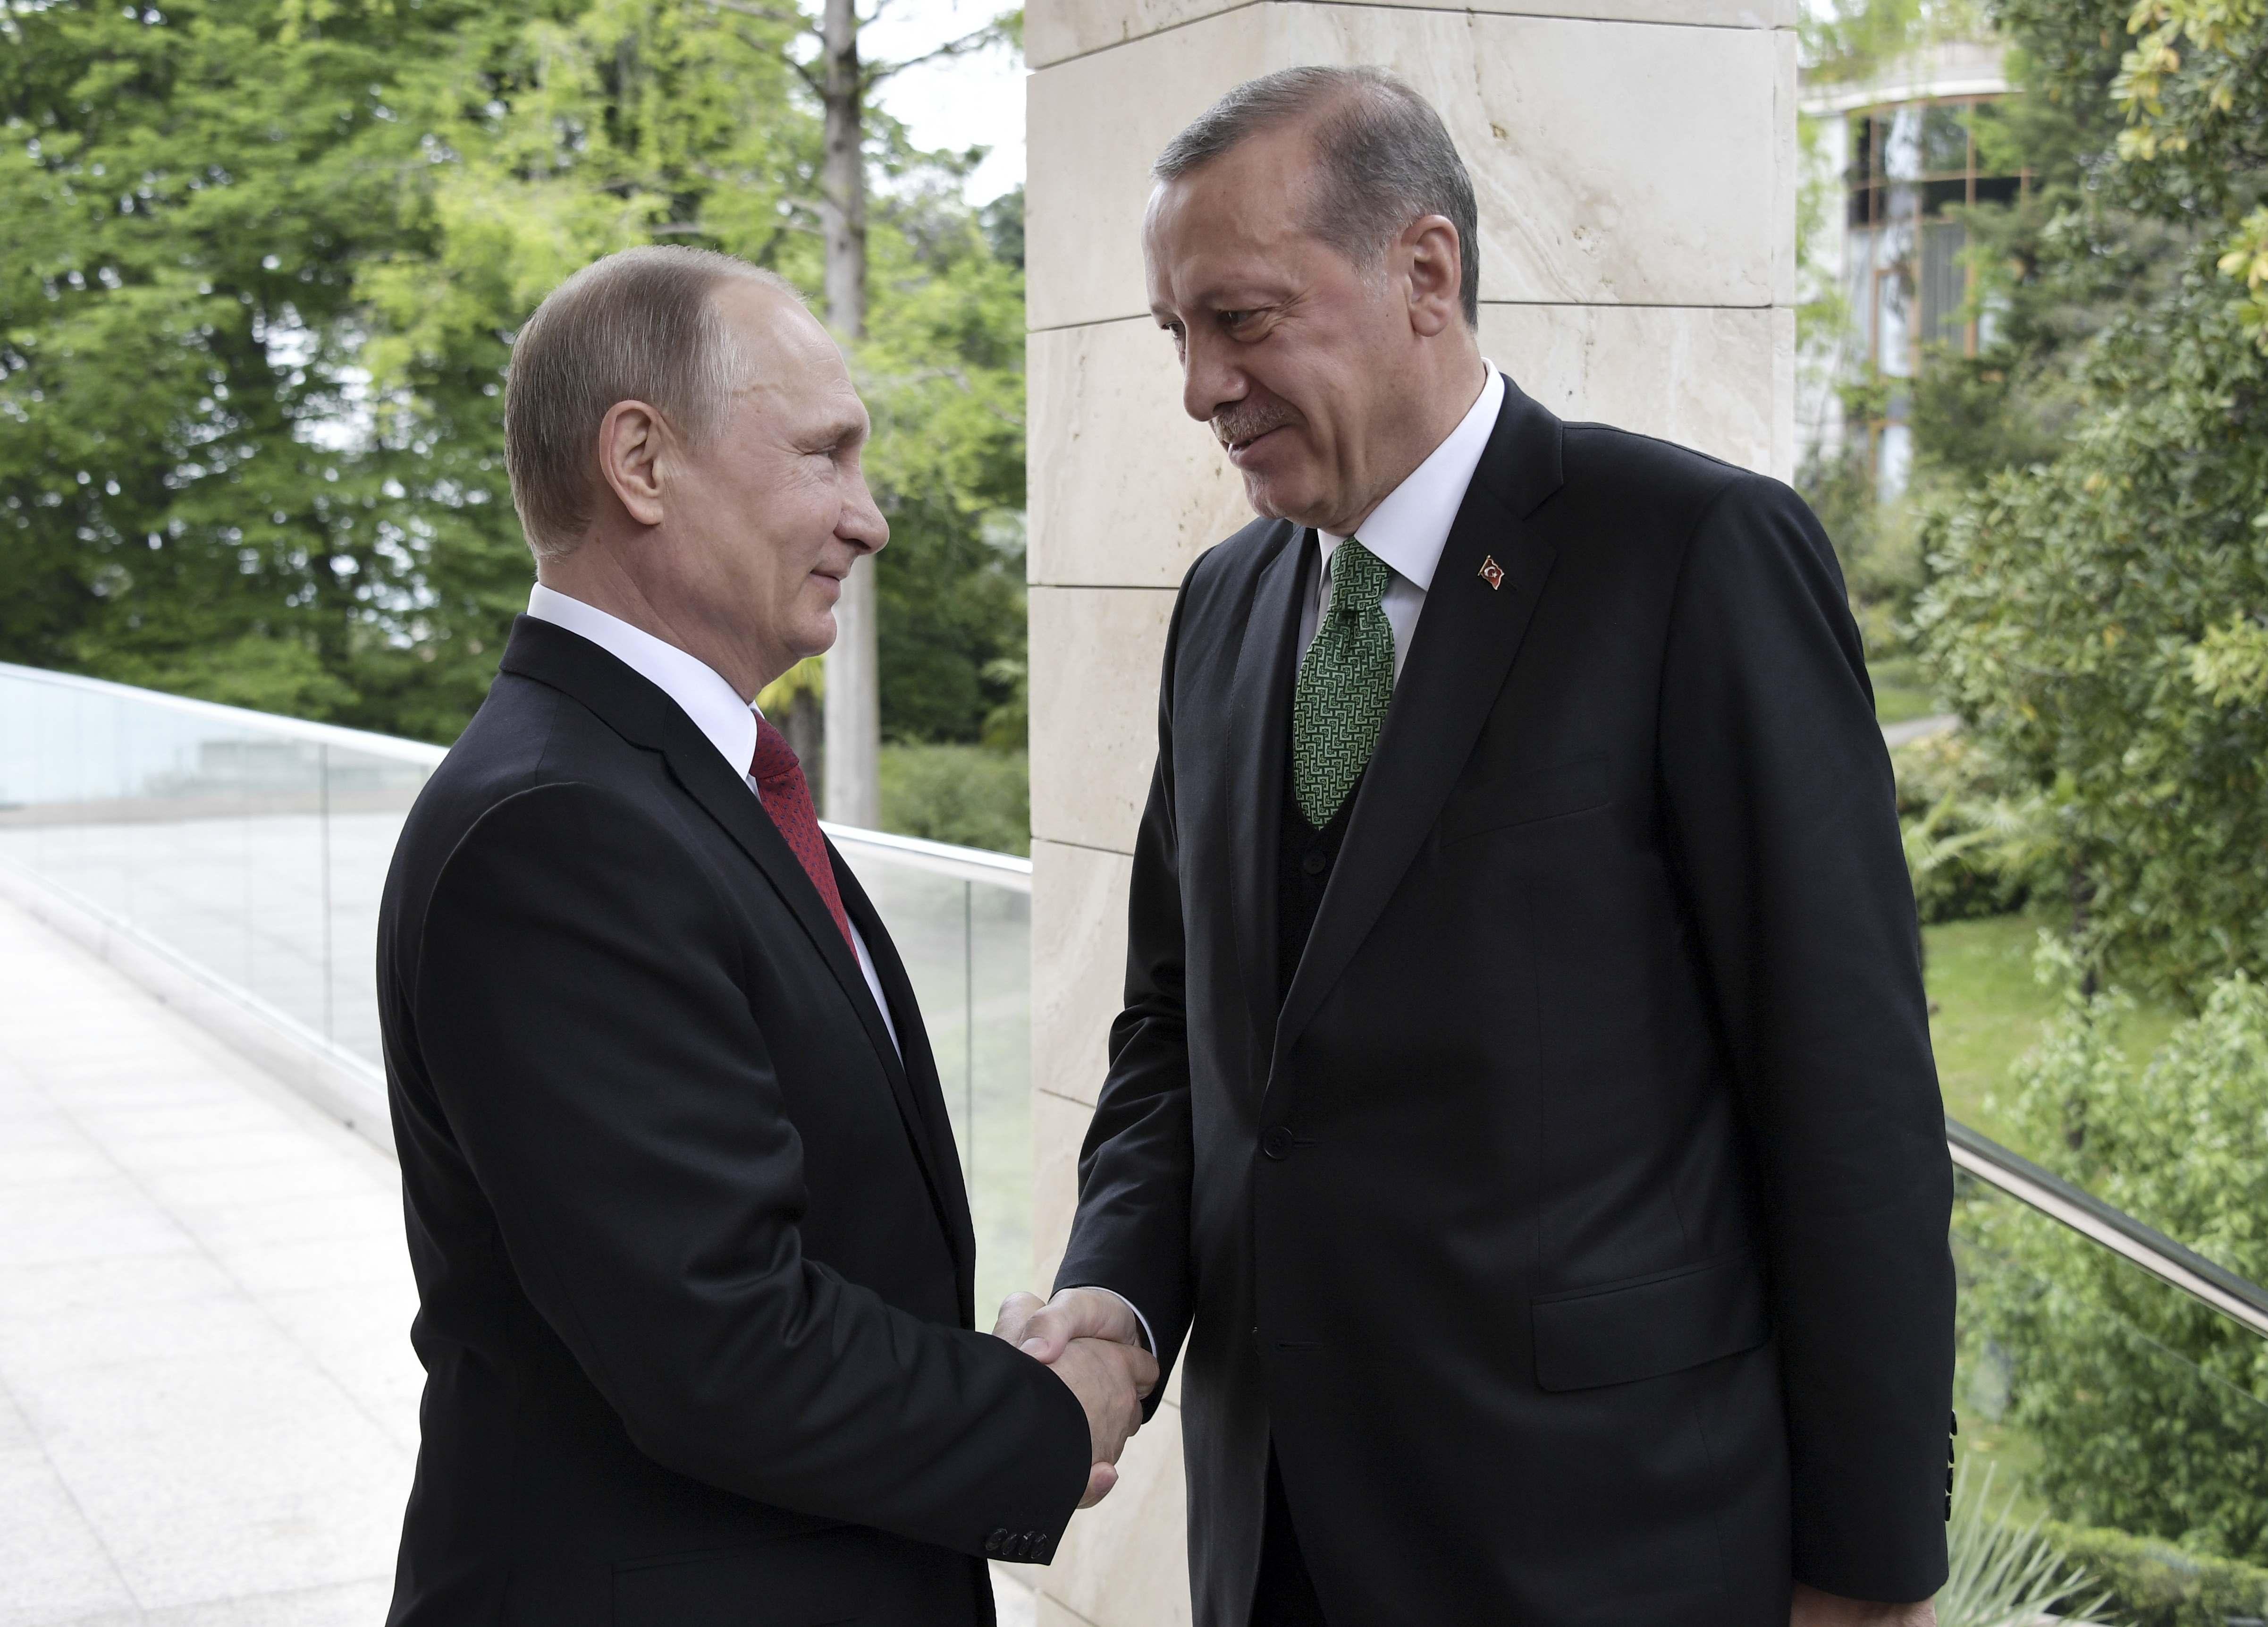 Russian President Vladimir Putin (L) shakes hands with his Turkish counterpart Tayyip Erdogan during a meeting in Sochi, Russia. Sputnik/Alexei Nikolsky/Kremlin via REUTERS